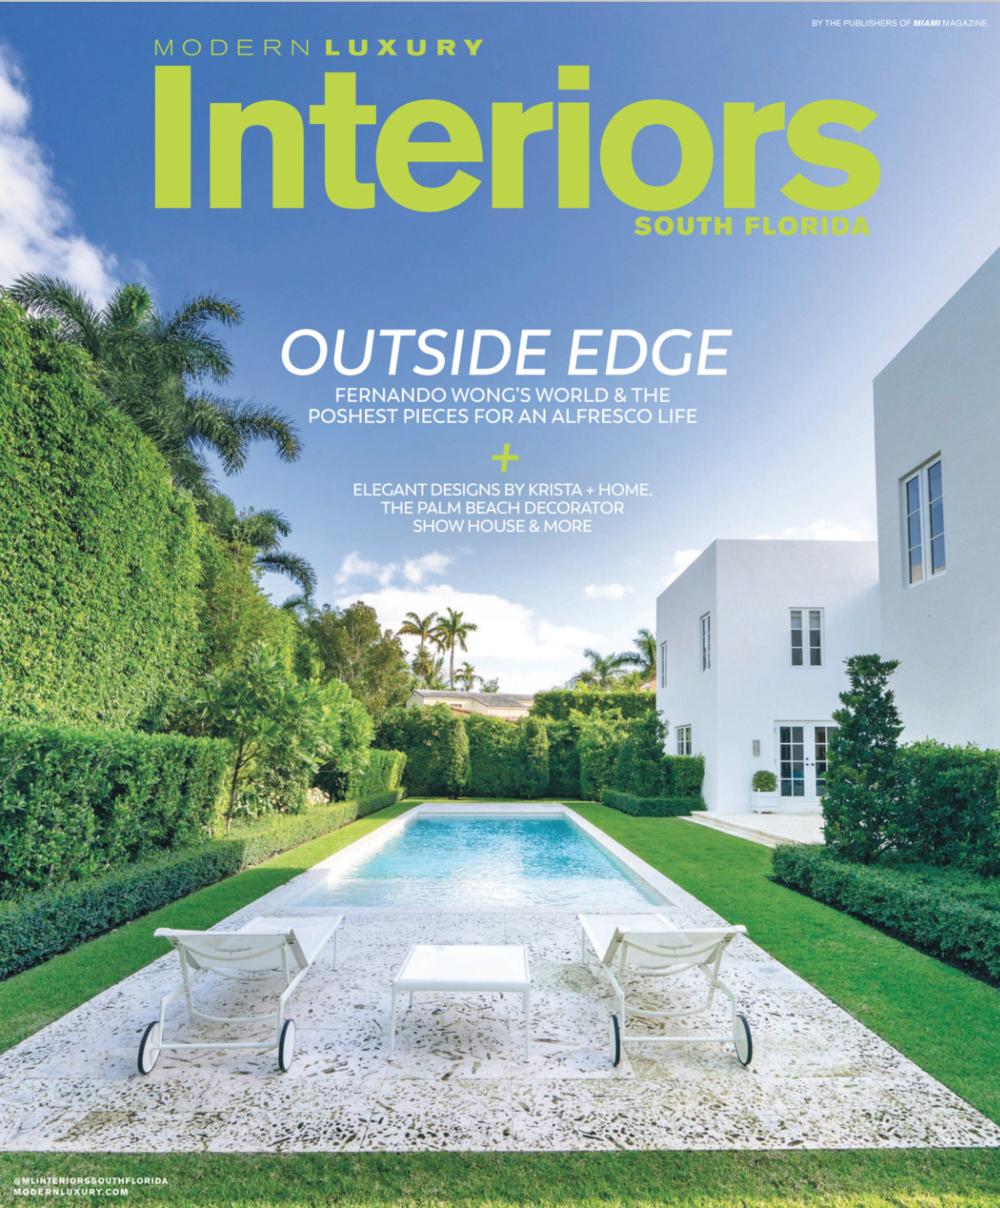 Modern Luxury Interiors Spring 2019